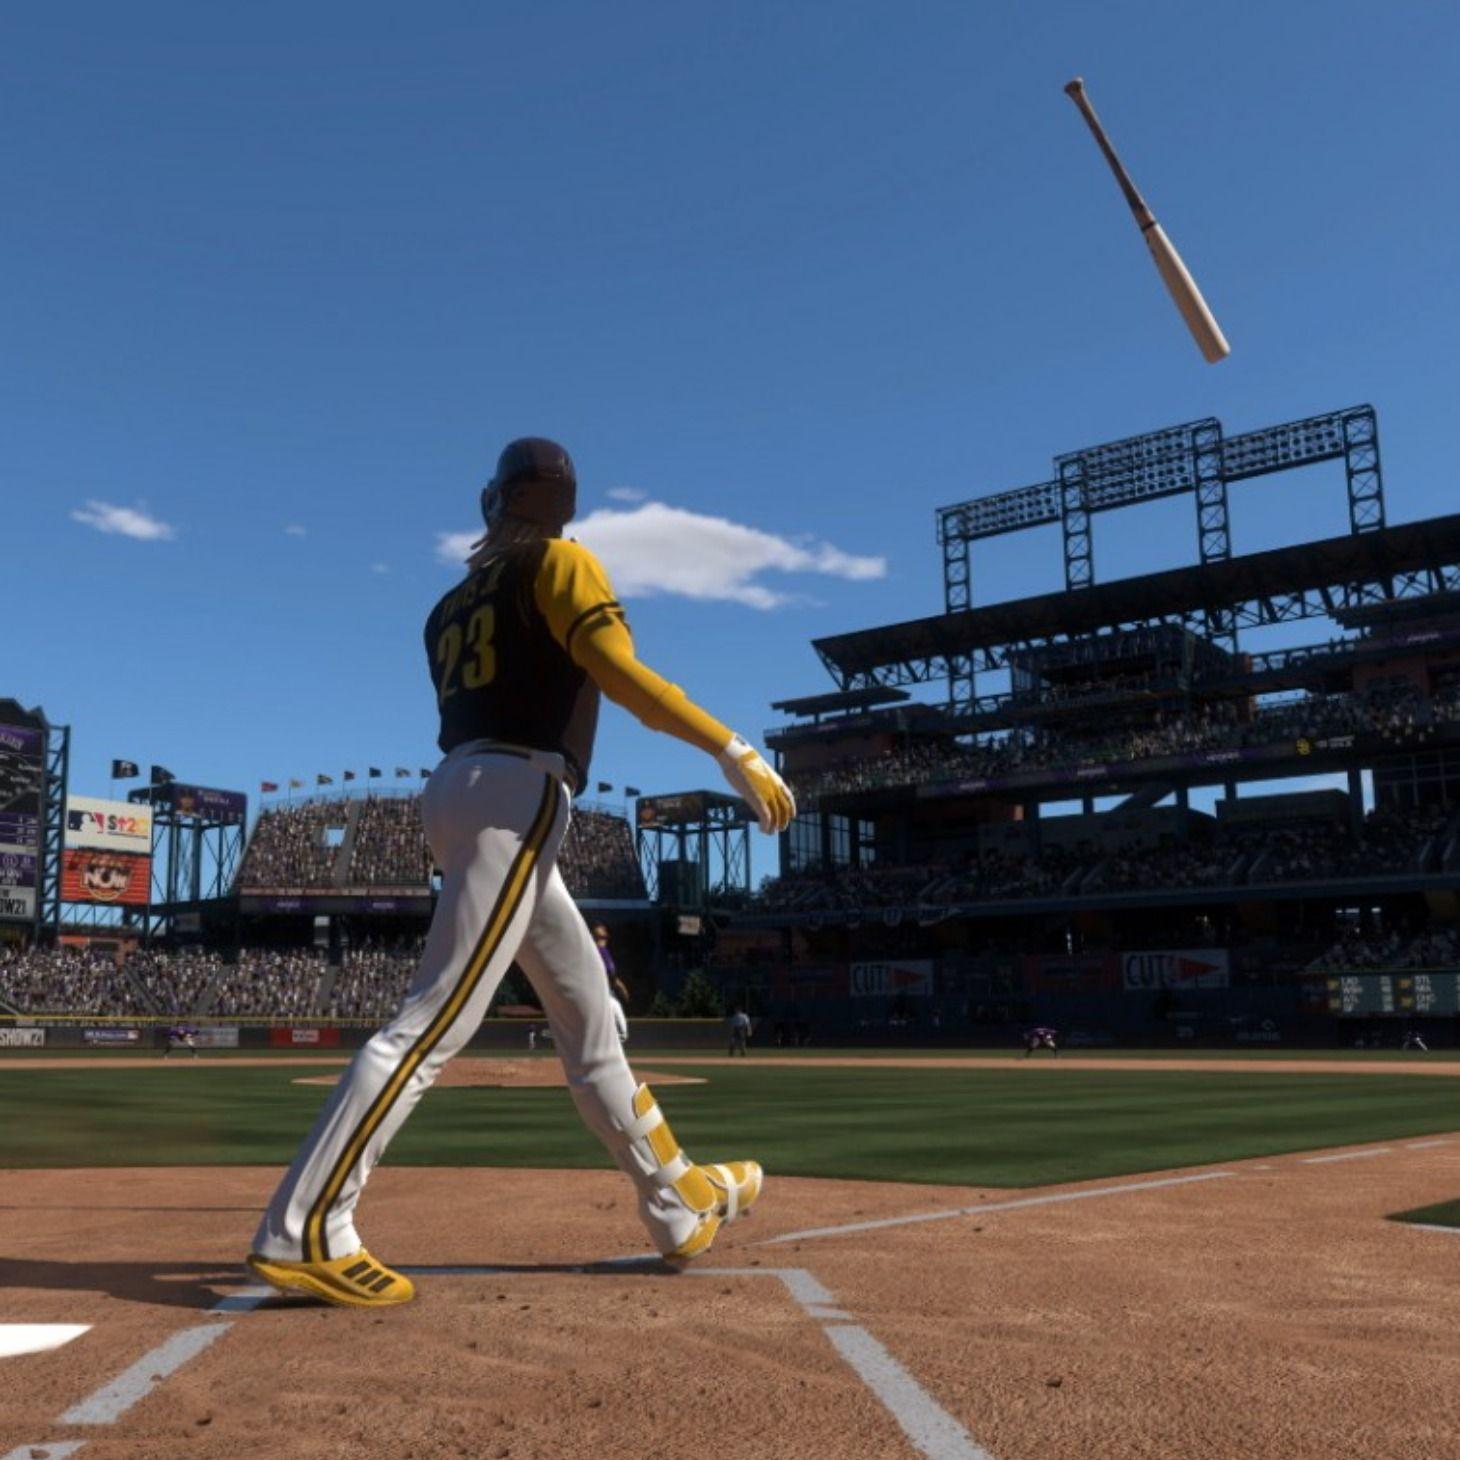 85: Hey, They've Got That Baseball